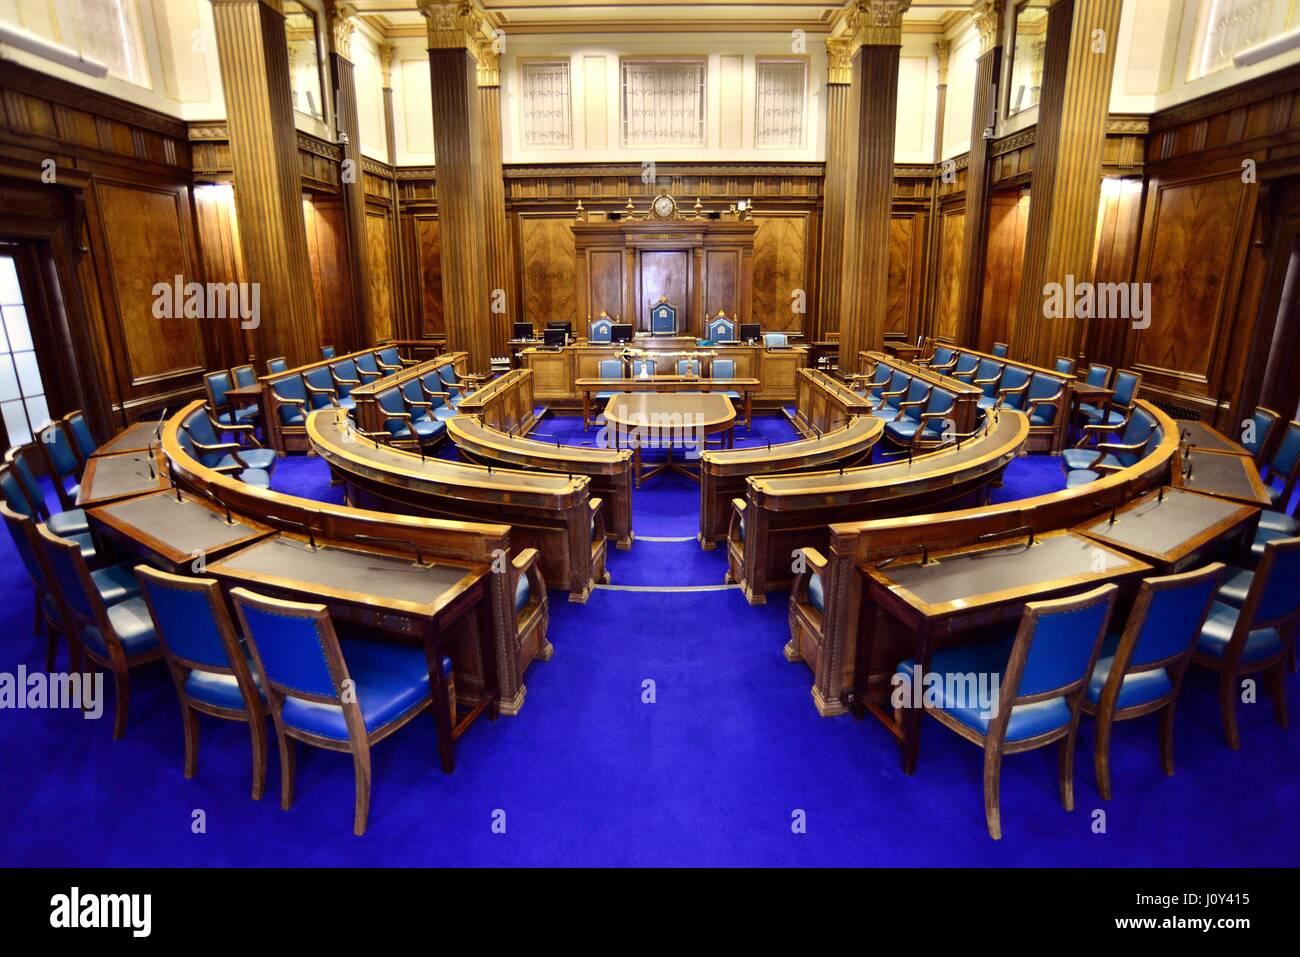 Council Chamber, Barnsley Town Hall, South Yorkshire, UK. - Stock Image